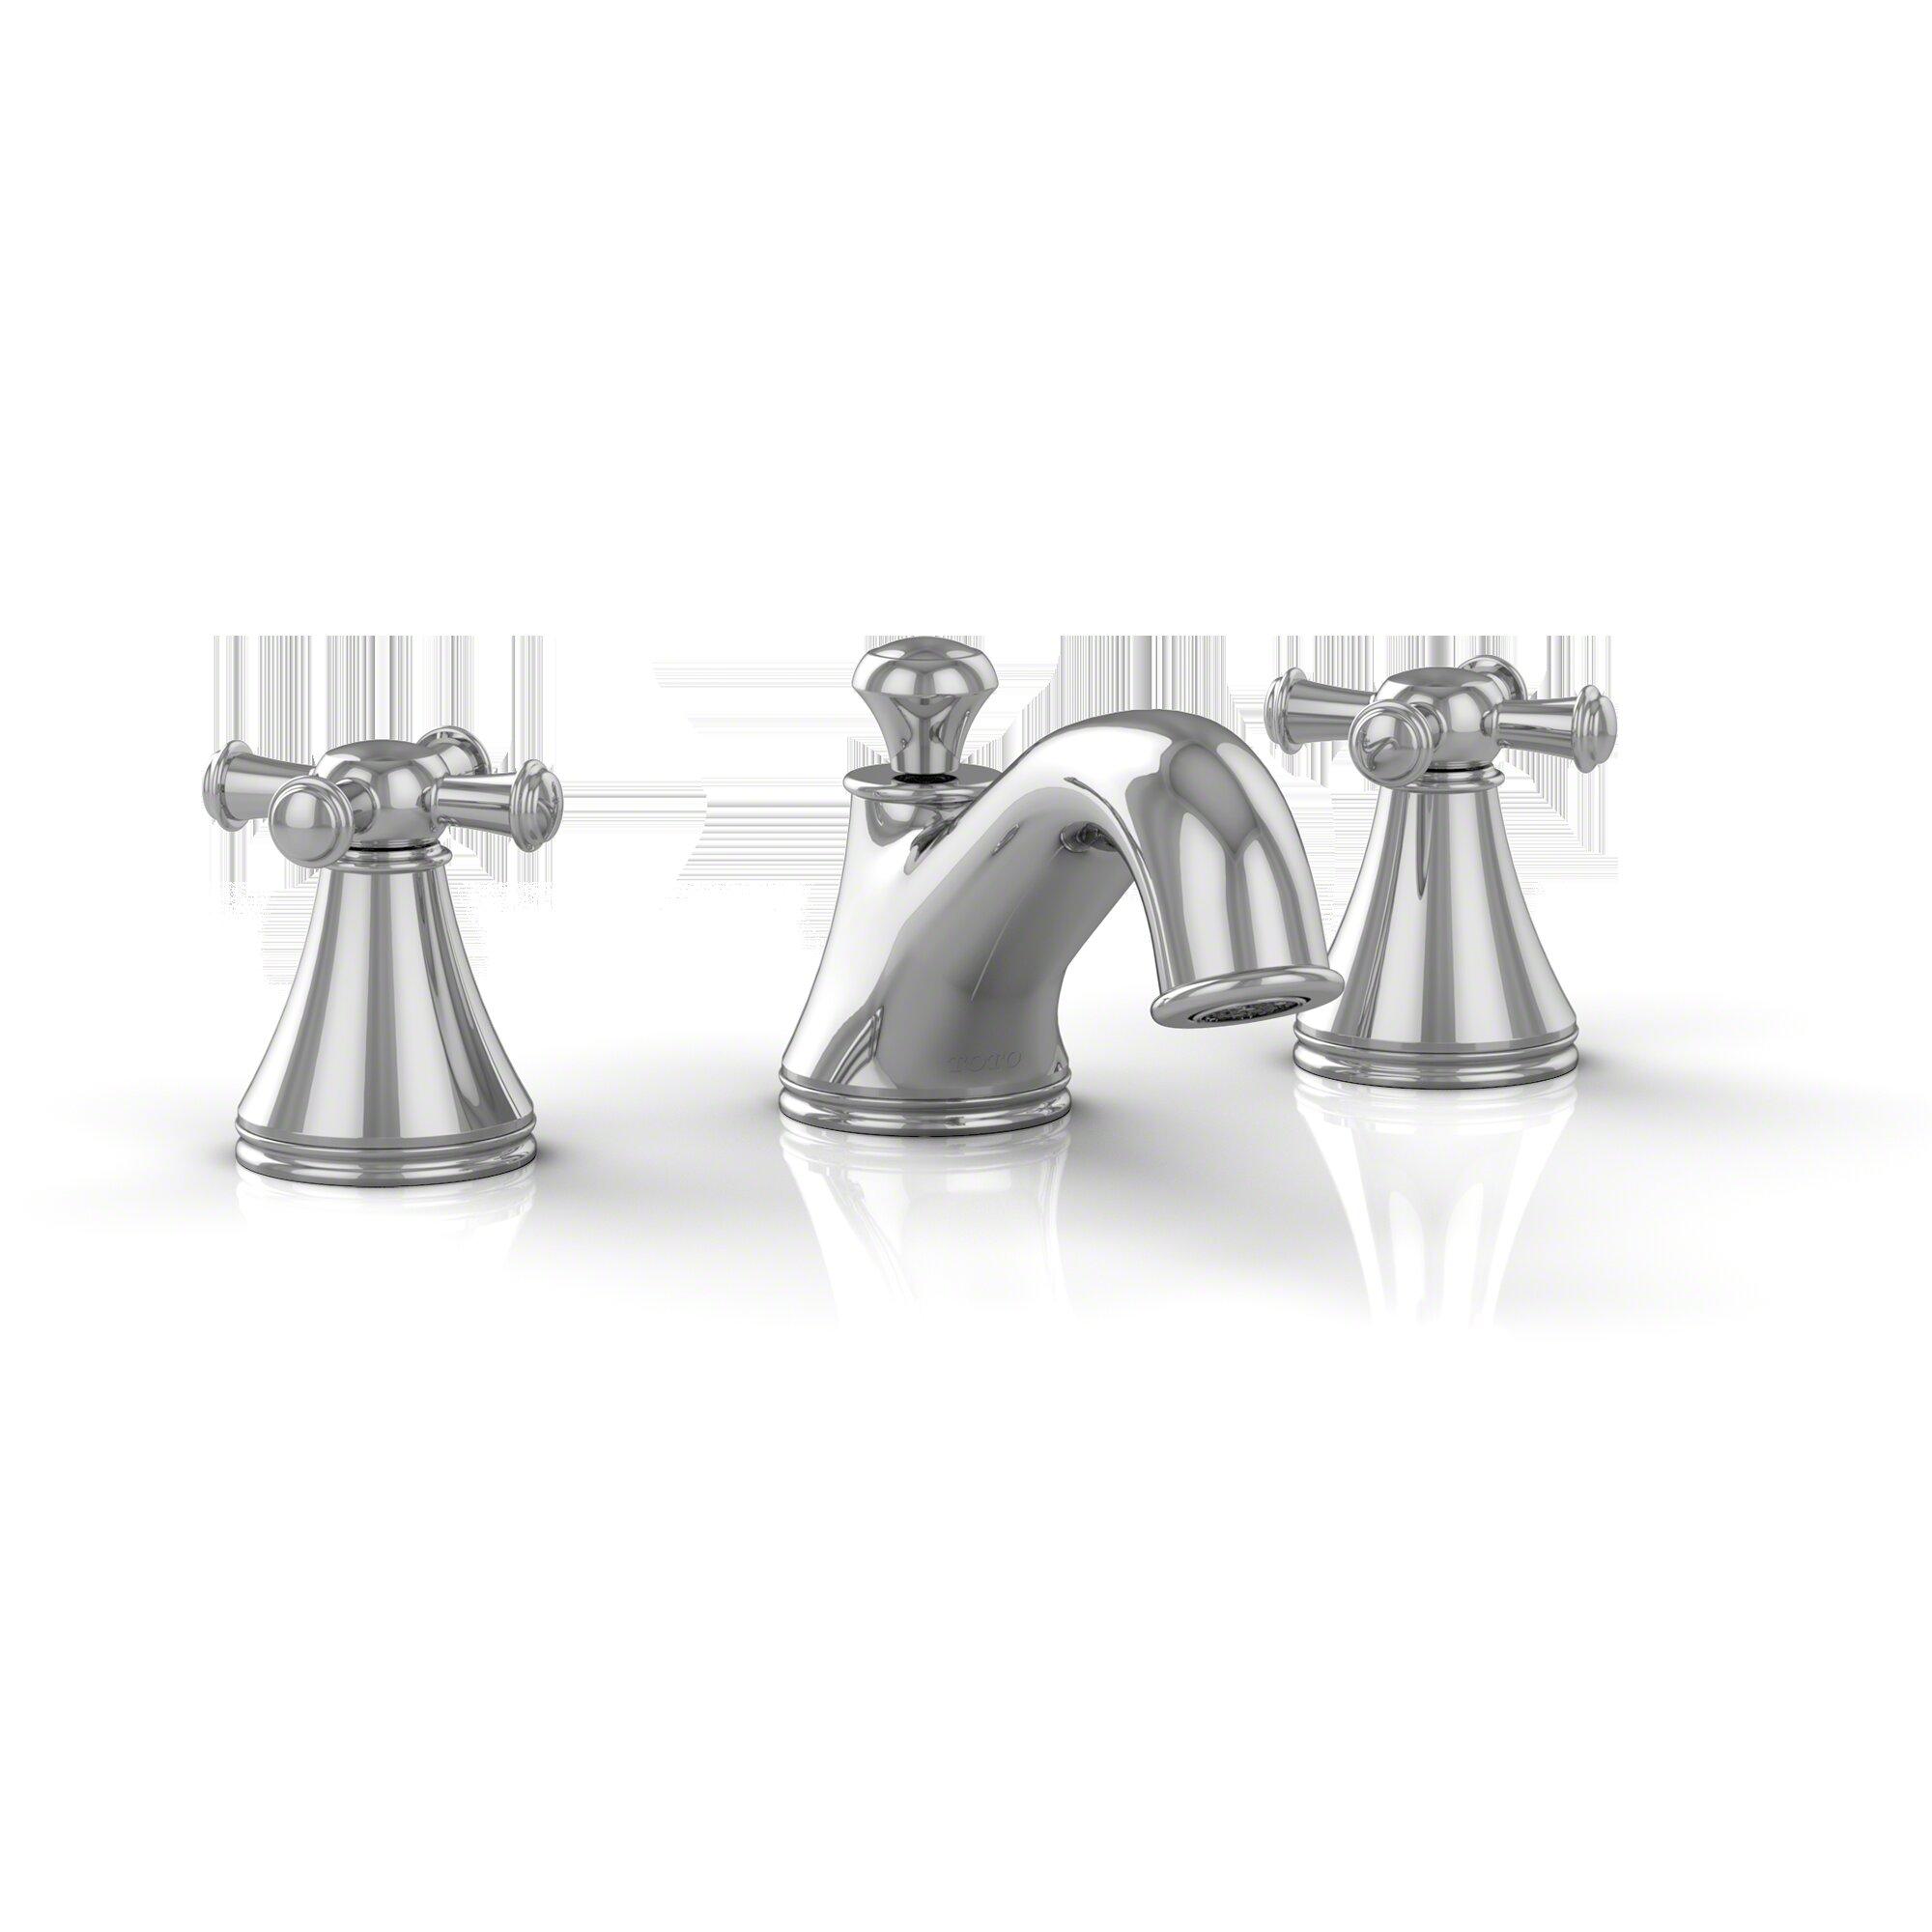 Toto Vivian Two Cross Handle Widespread Bathroom Faucet with Drain ...